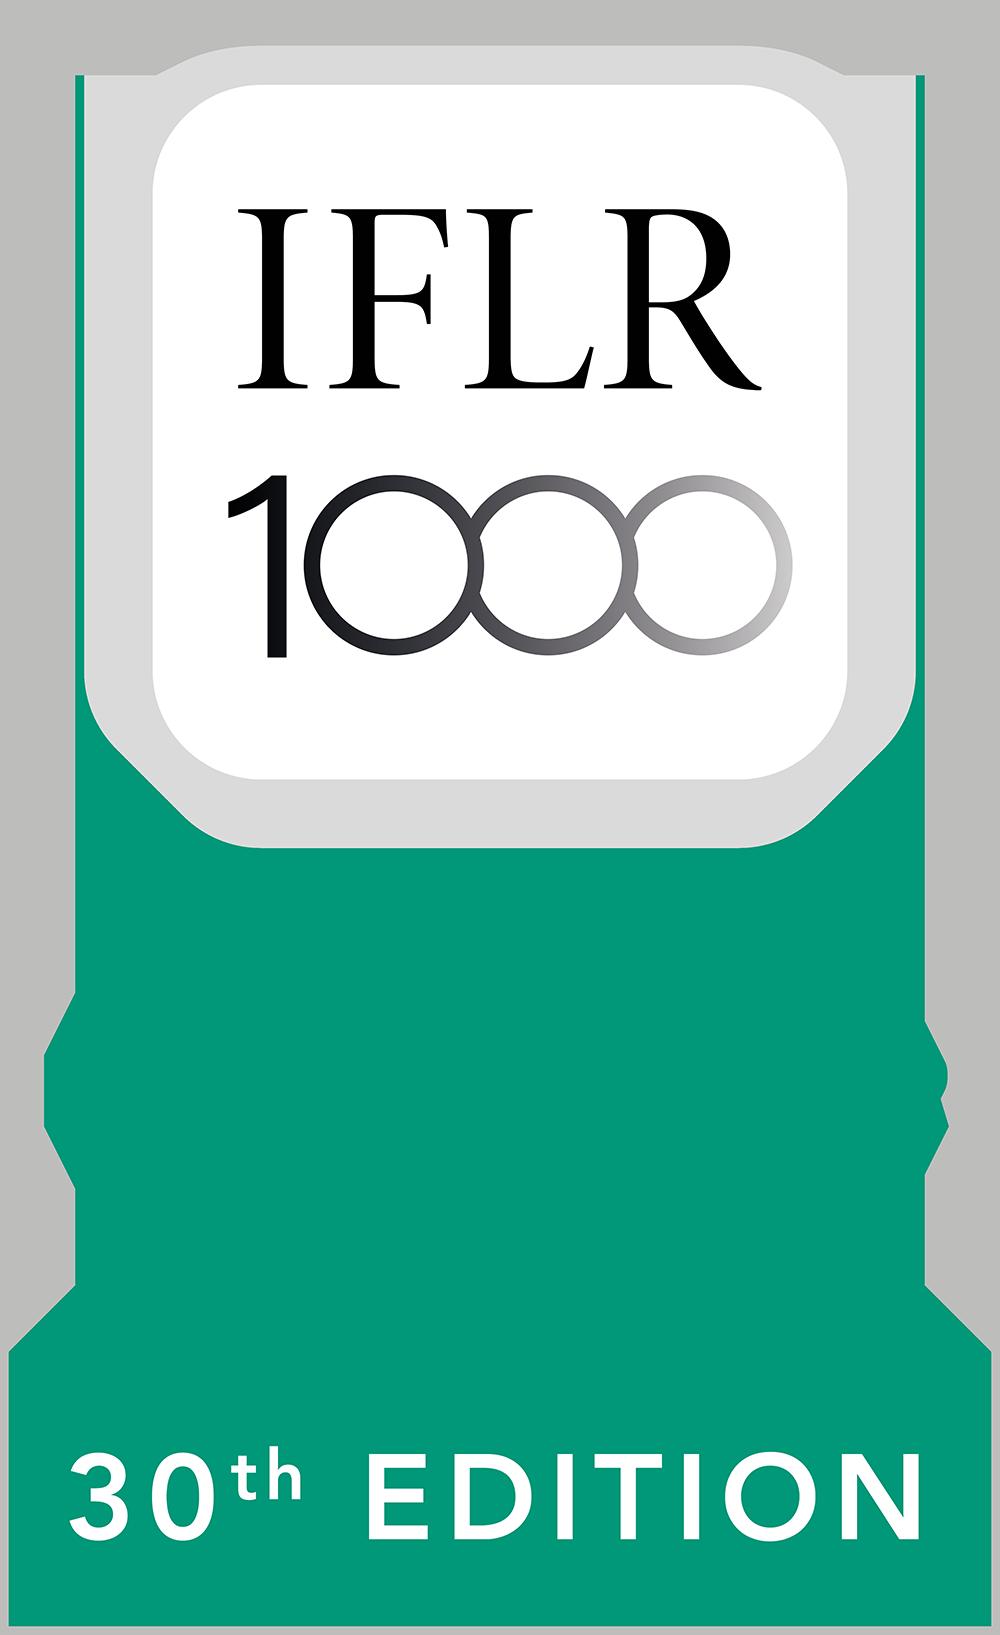 IFLR Notable Practitioner 2021